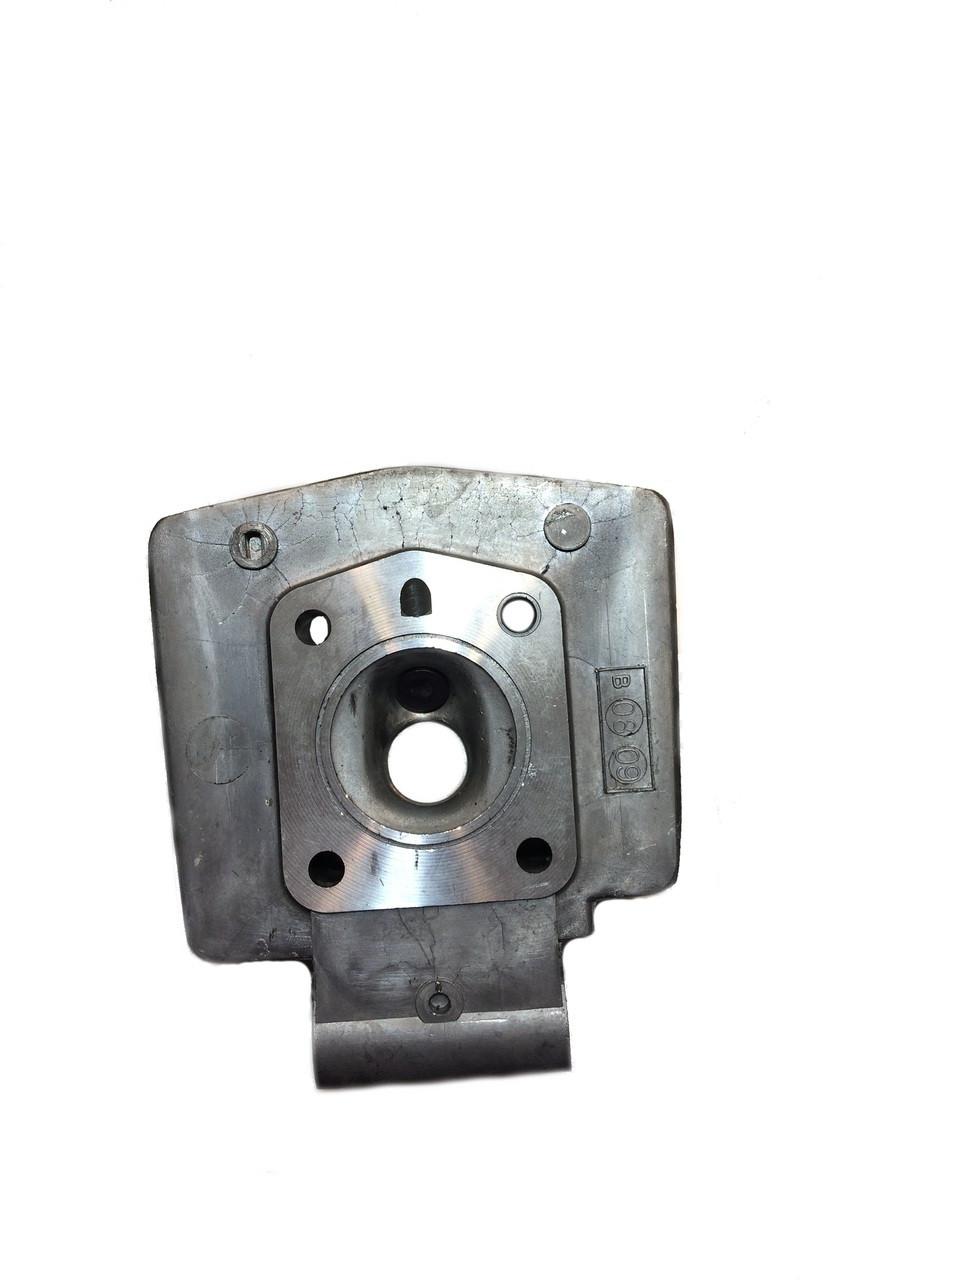 Motobecane AV10 50cc Cylinder Head W Decomp